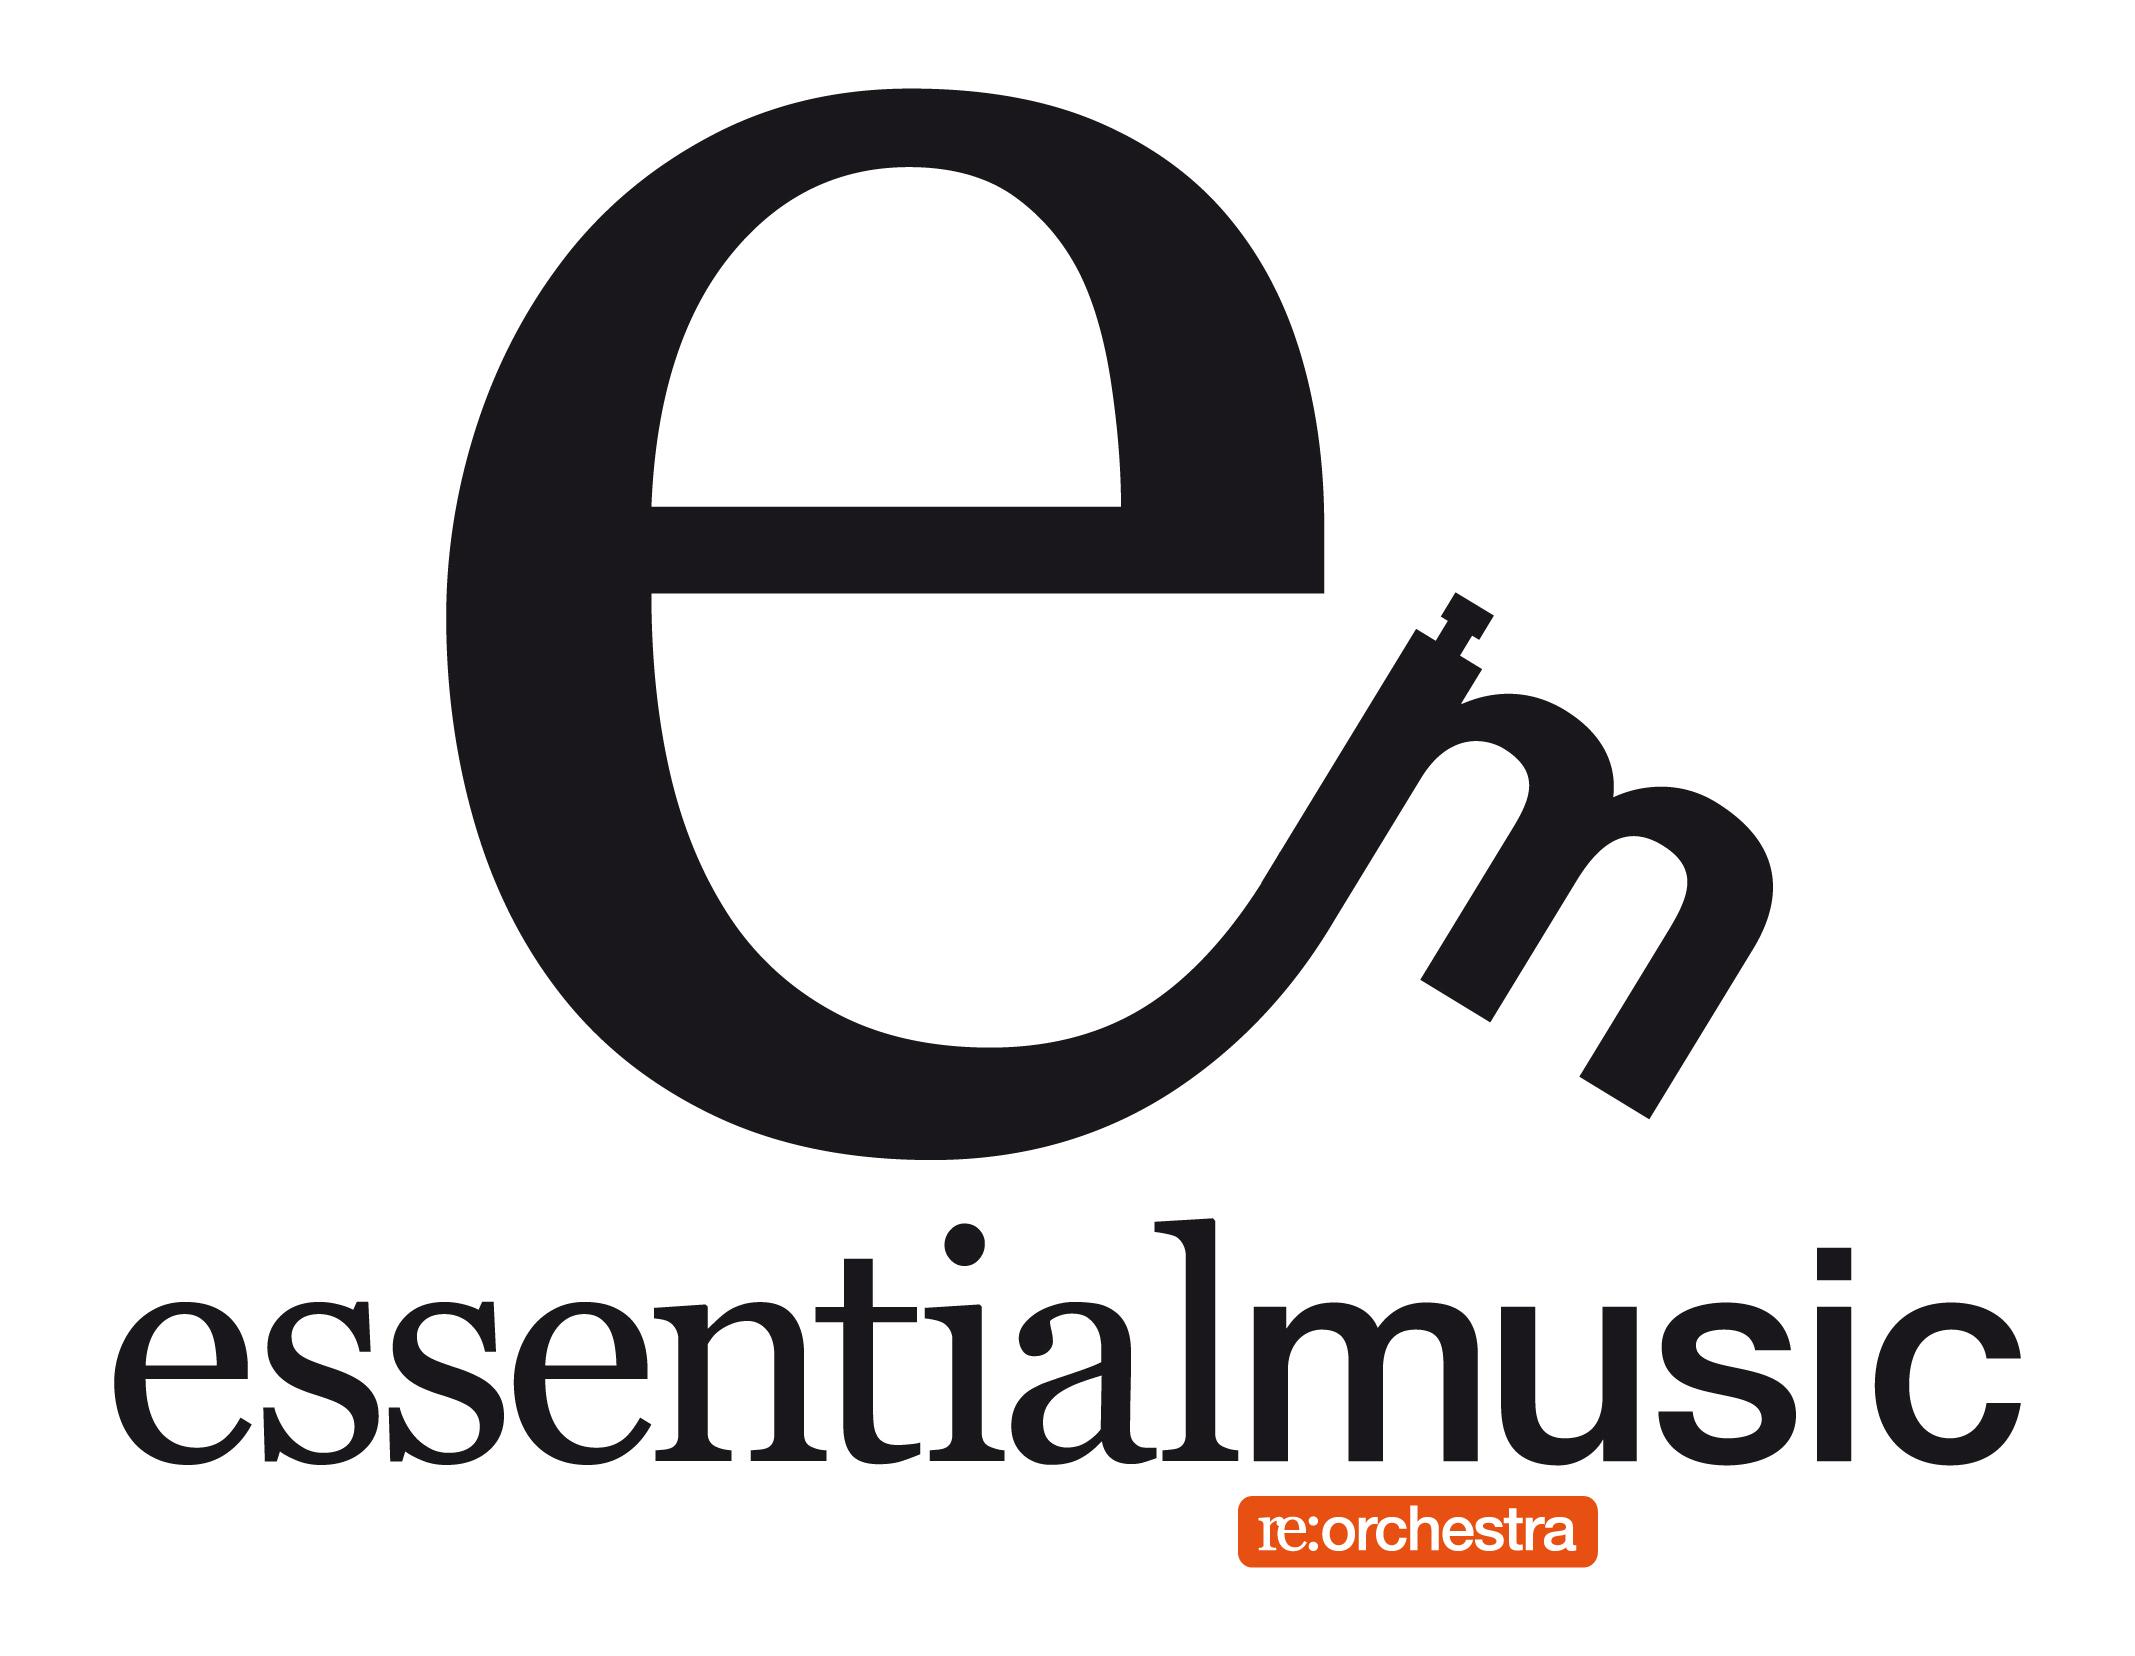 re_essential music logo